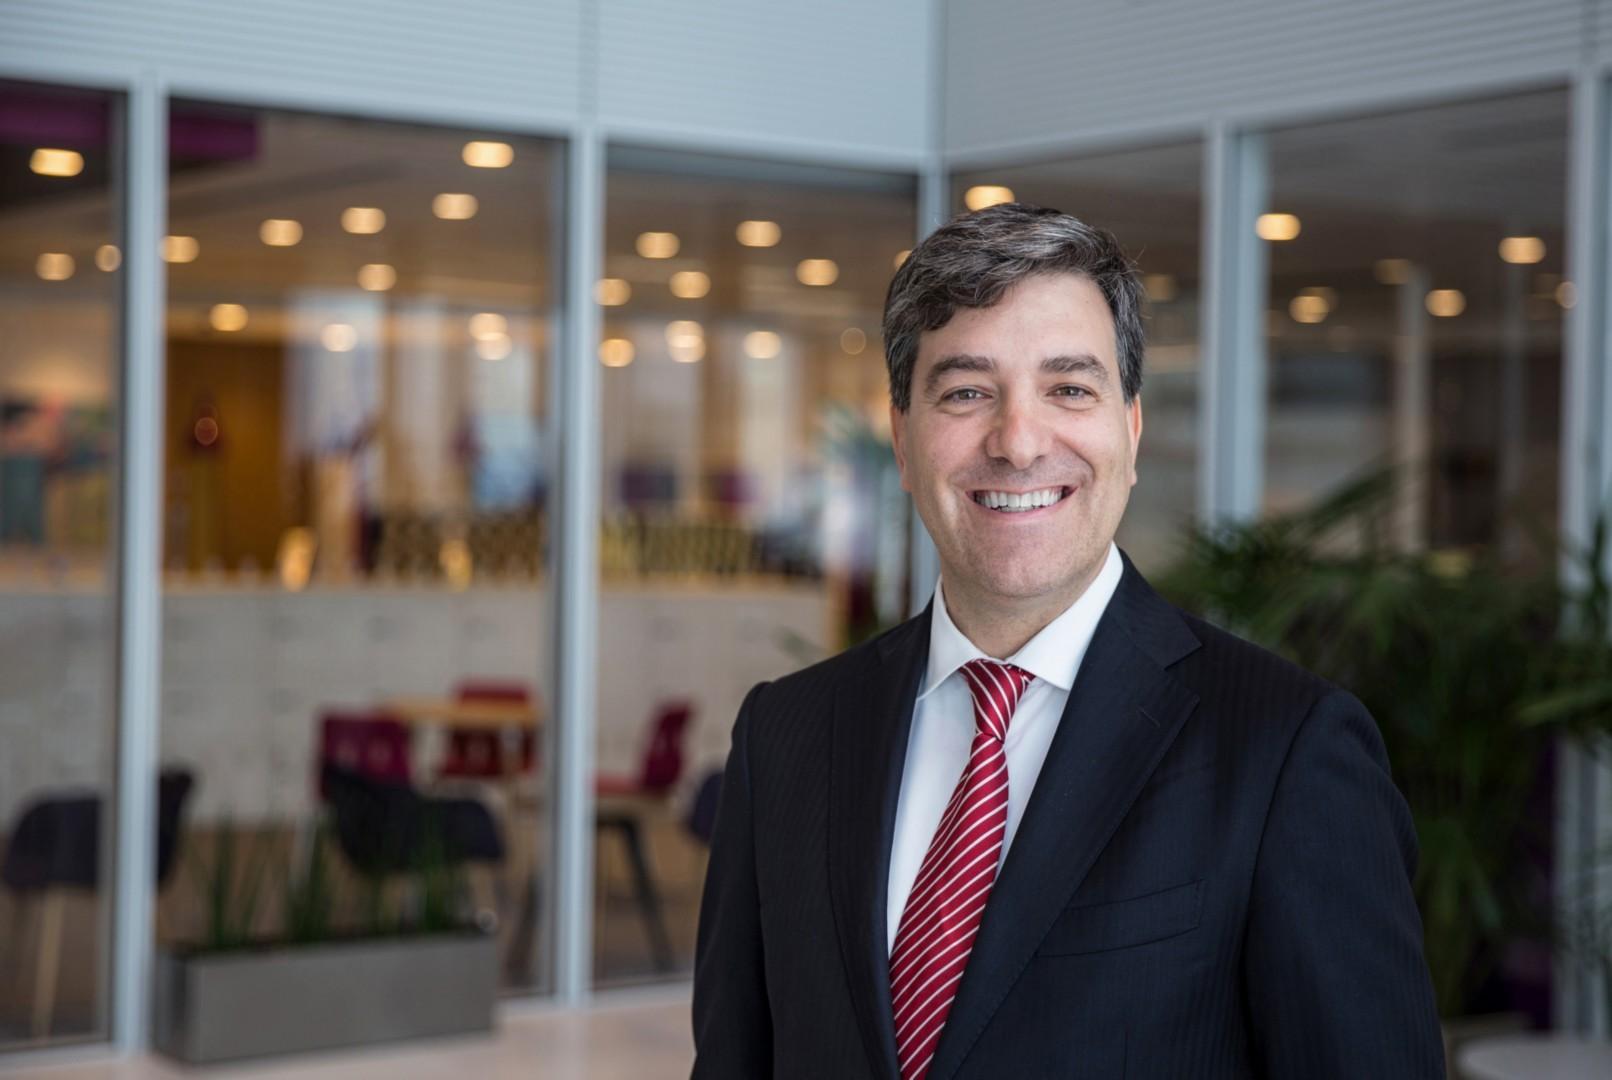 FEDERICO GUERRERI - Supervision, Risks & Profitability